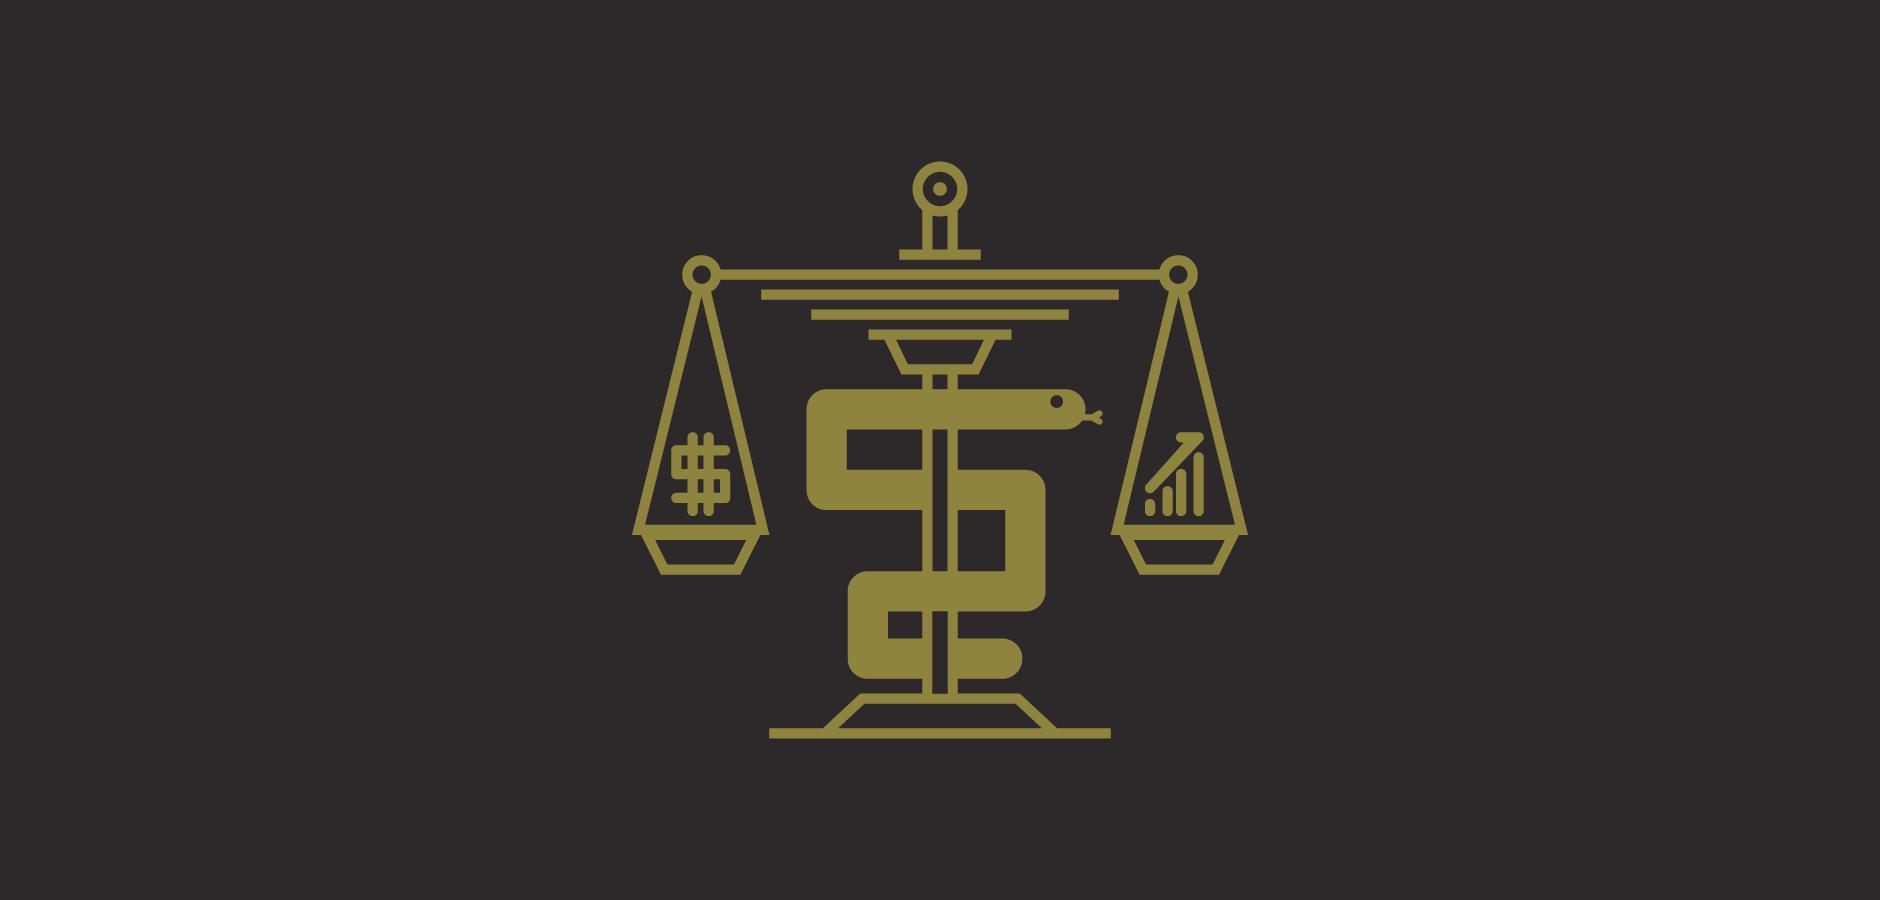 Dot Pixel - Illustration - Healthcare Balance